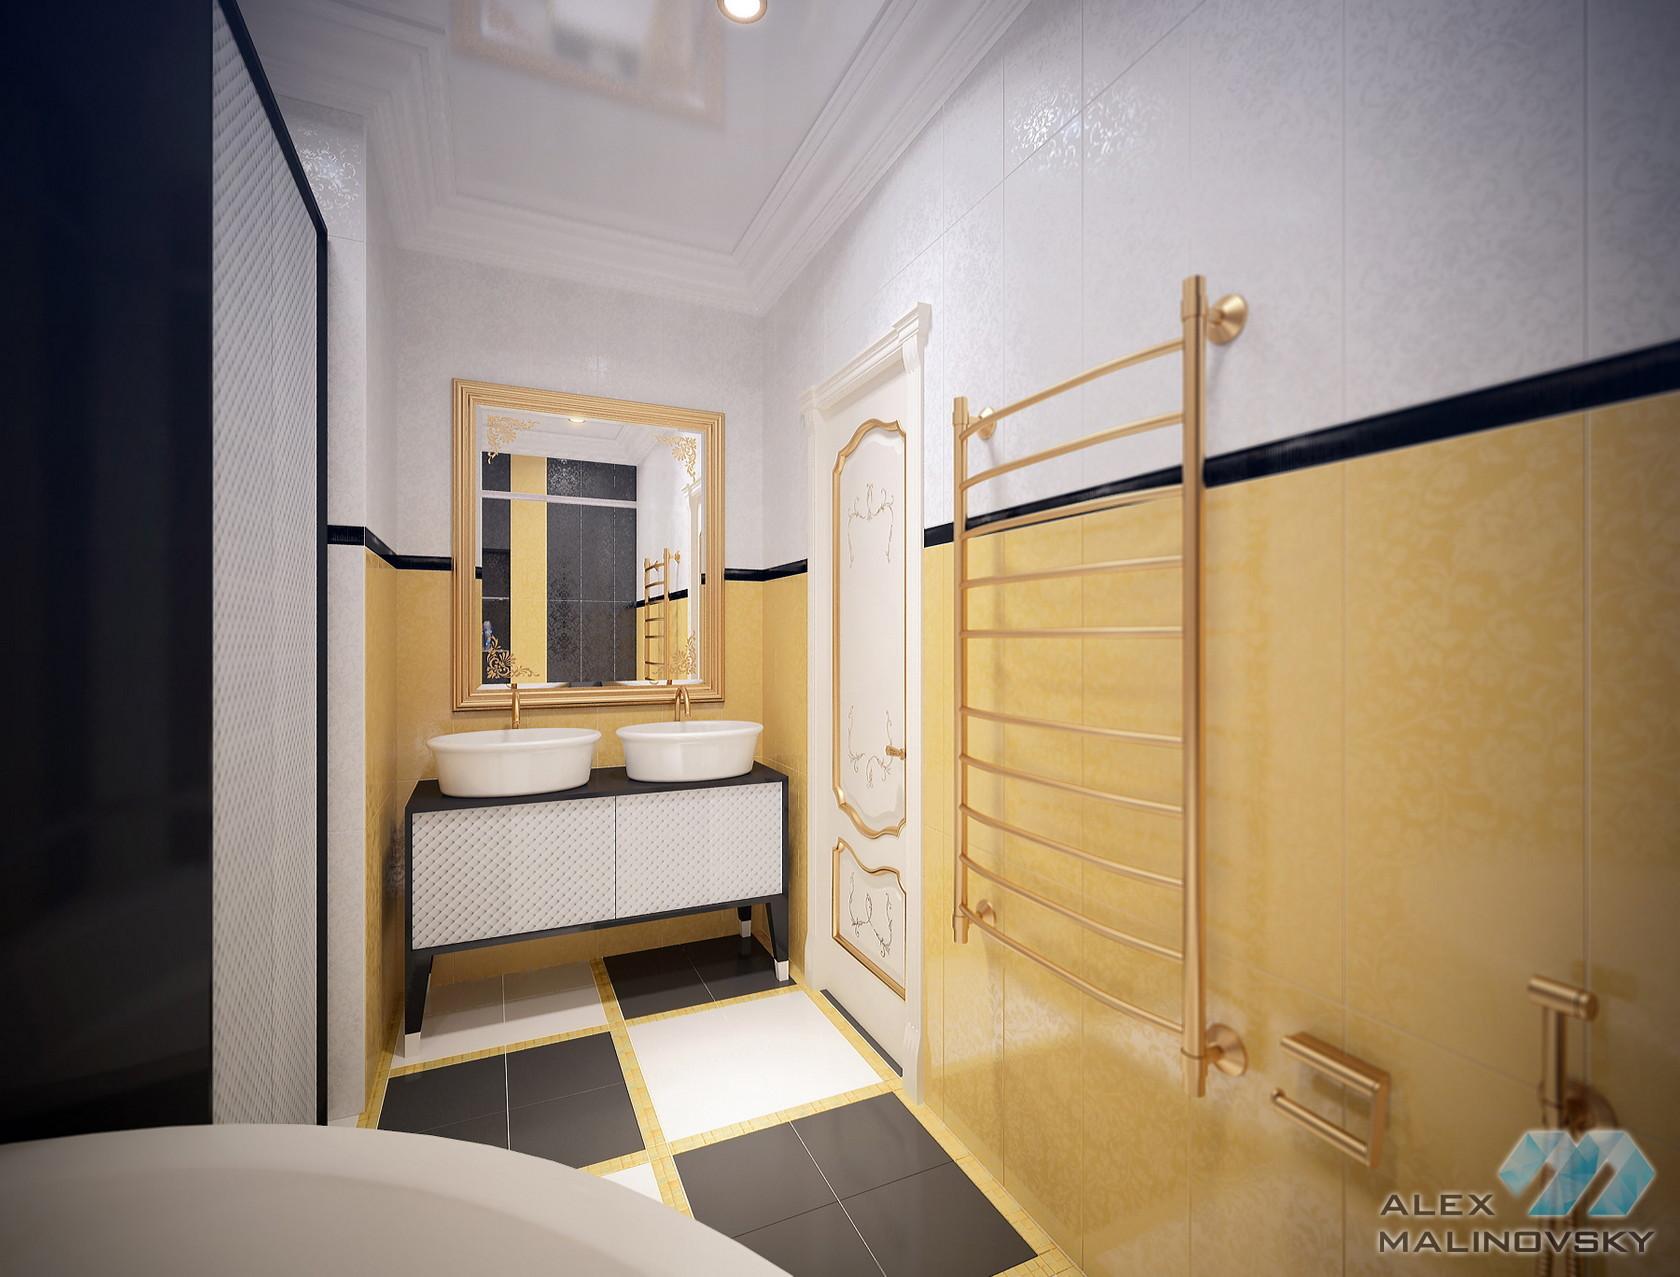 Санузел 2, 4х комнатная квартира, ЖК Парус, СПб